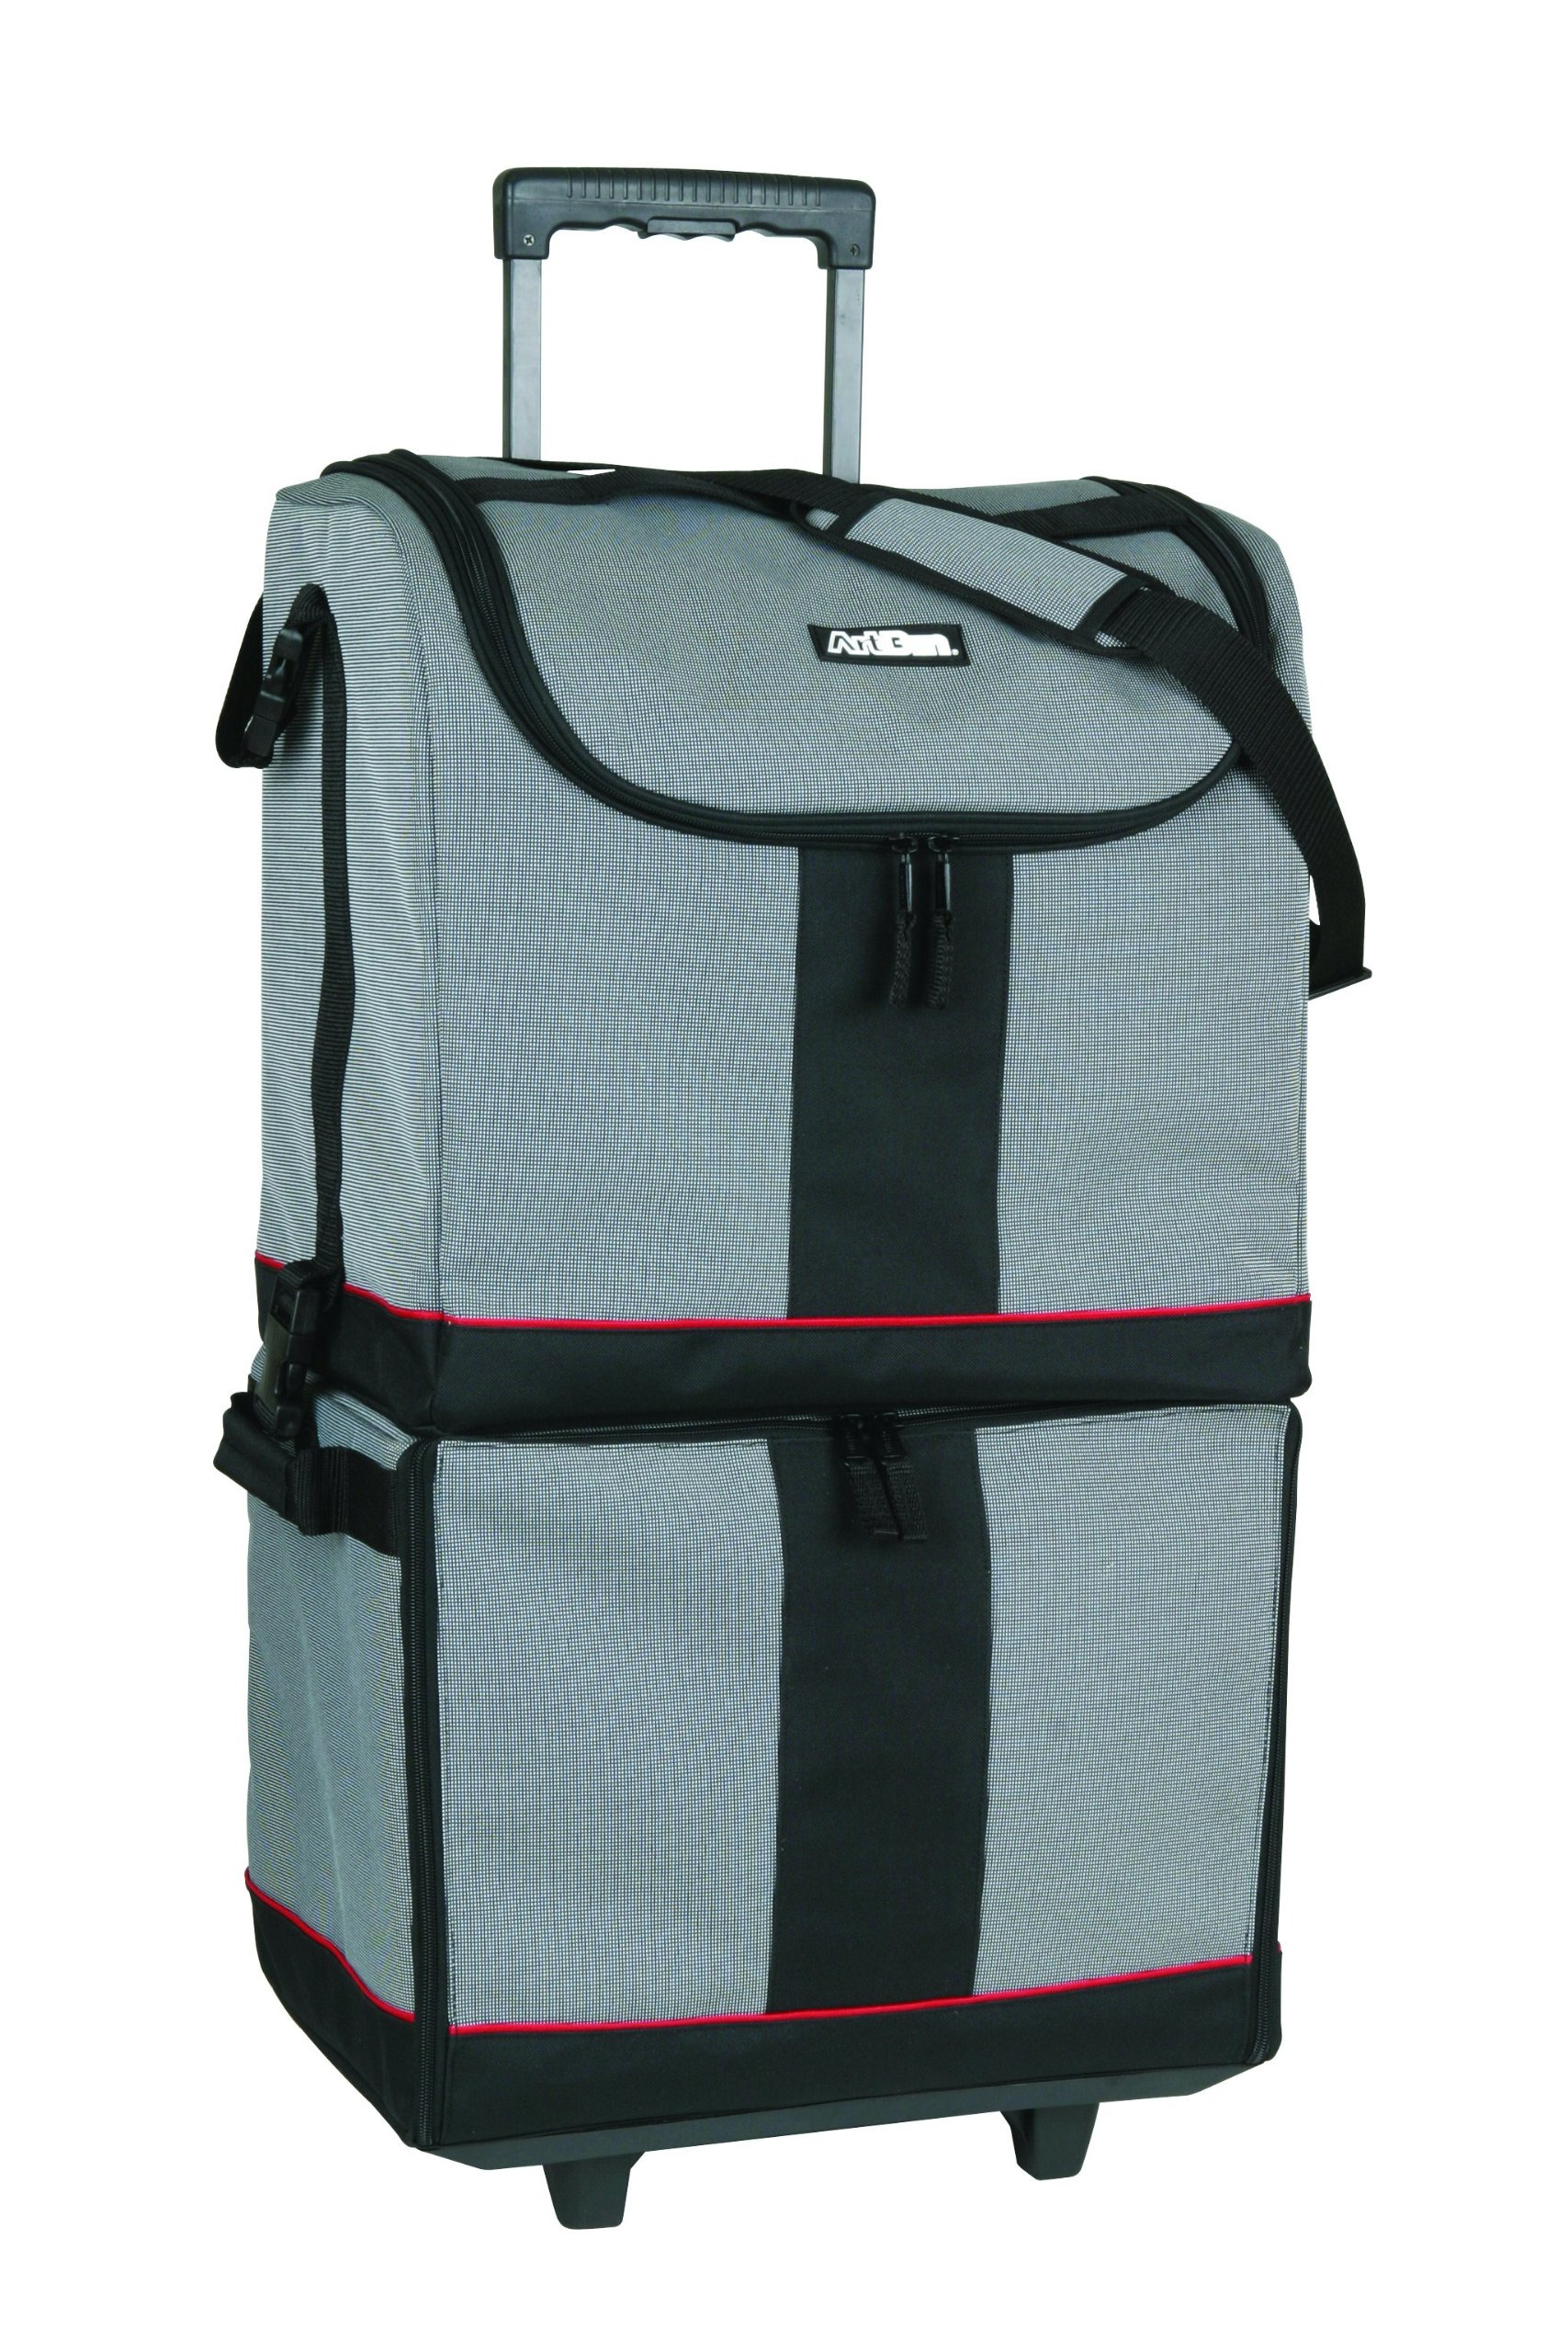 artbin tote express black gray rolling art craft storage bag 6922sa ebay. Black Bedroom Furniture Sets. Home Design Ideas